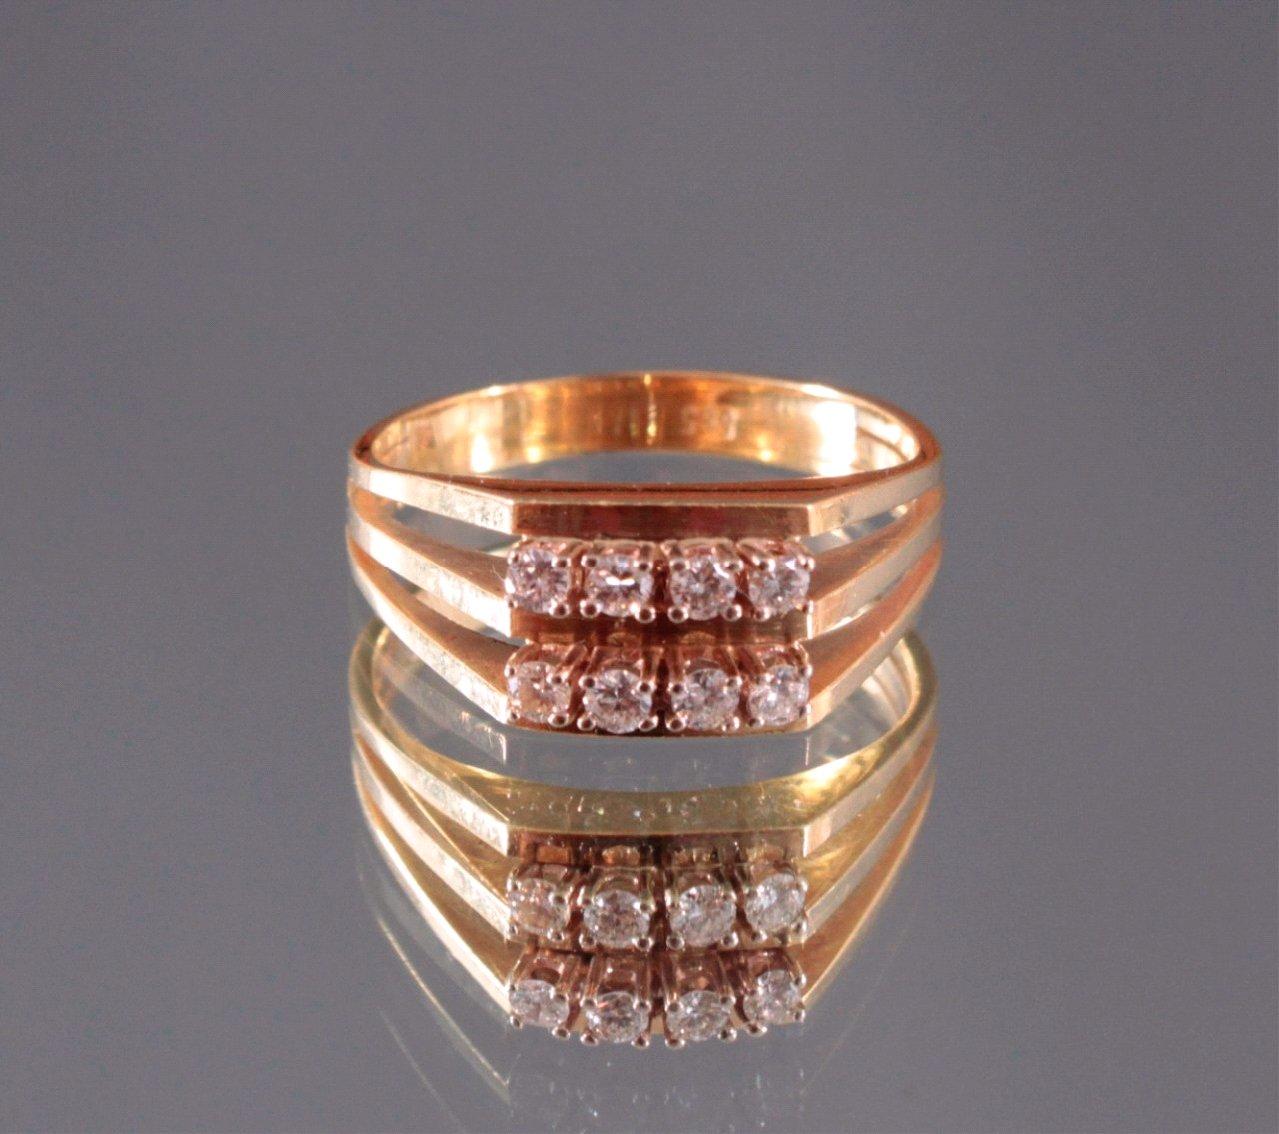 Damenring mit 6 Diamanten, 585/000 Gelb Gold